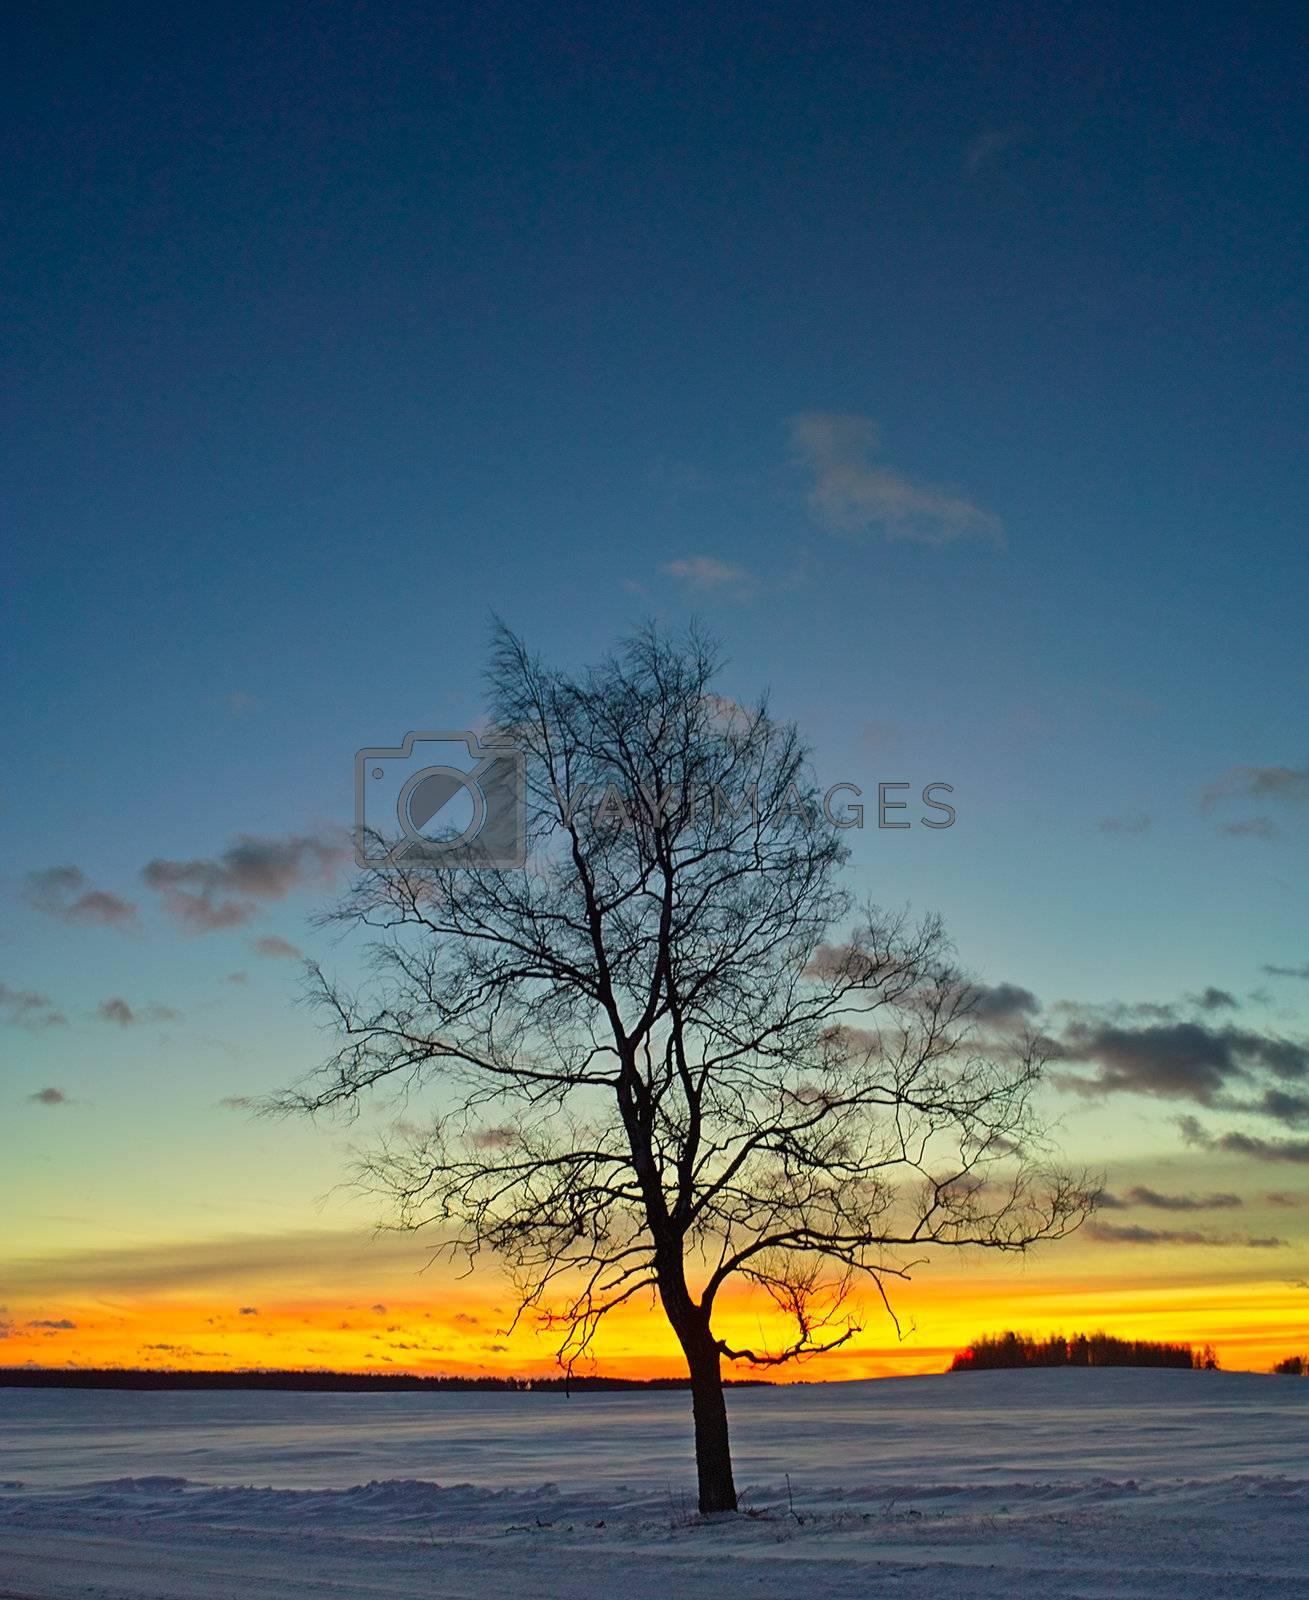 birch tree silhouette at orange winter sunrise